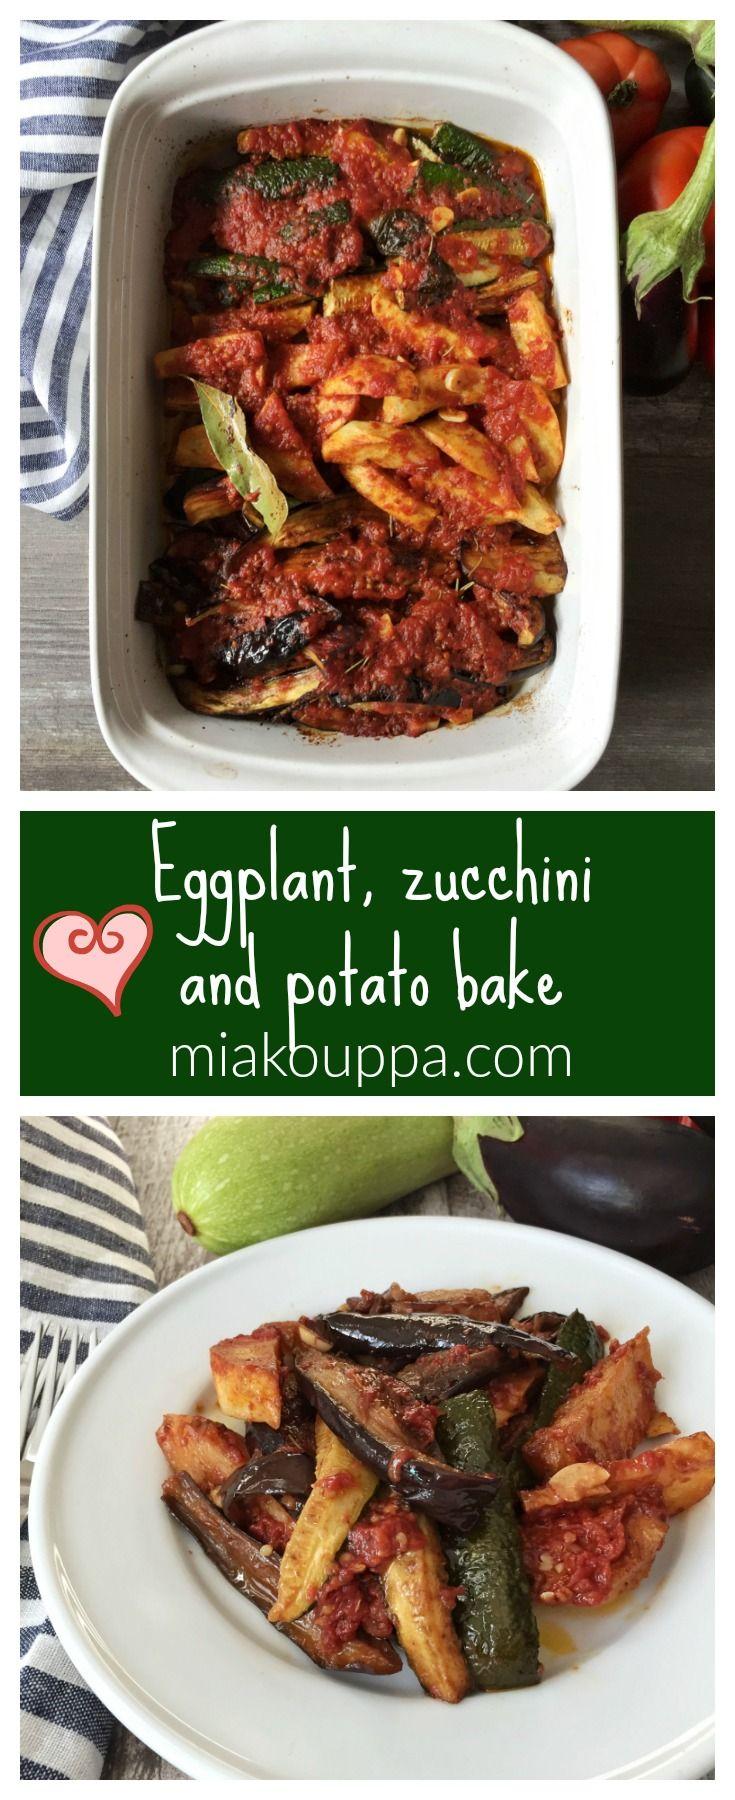 Eggplant, zucchini and potato bake #eggplant #zucchini #greek #greekrecipes